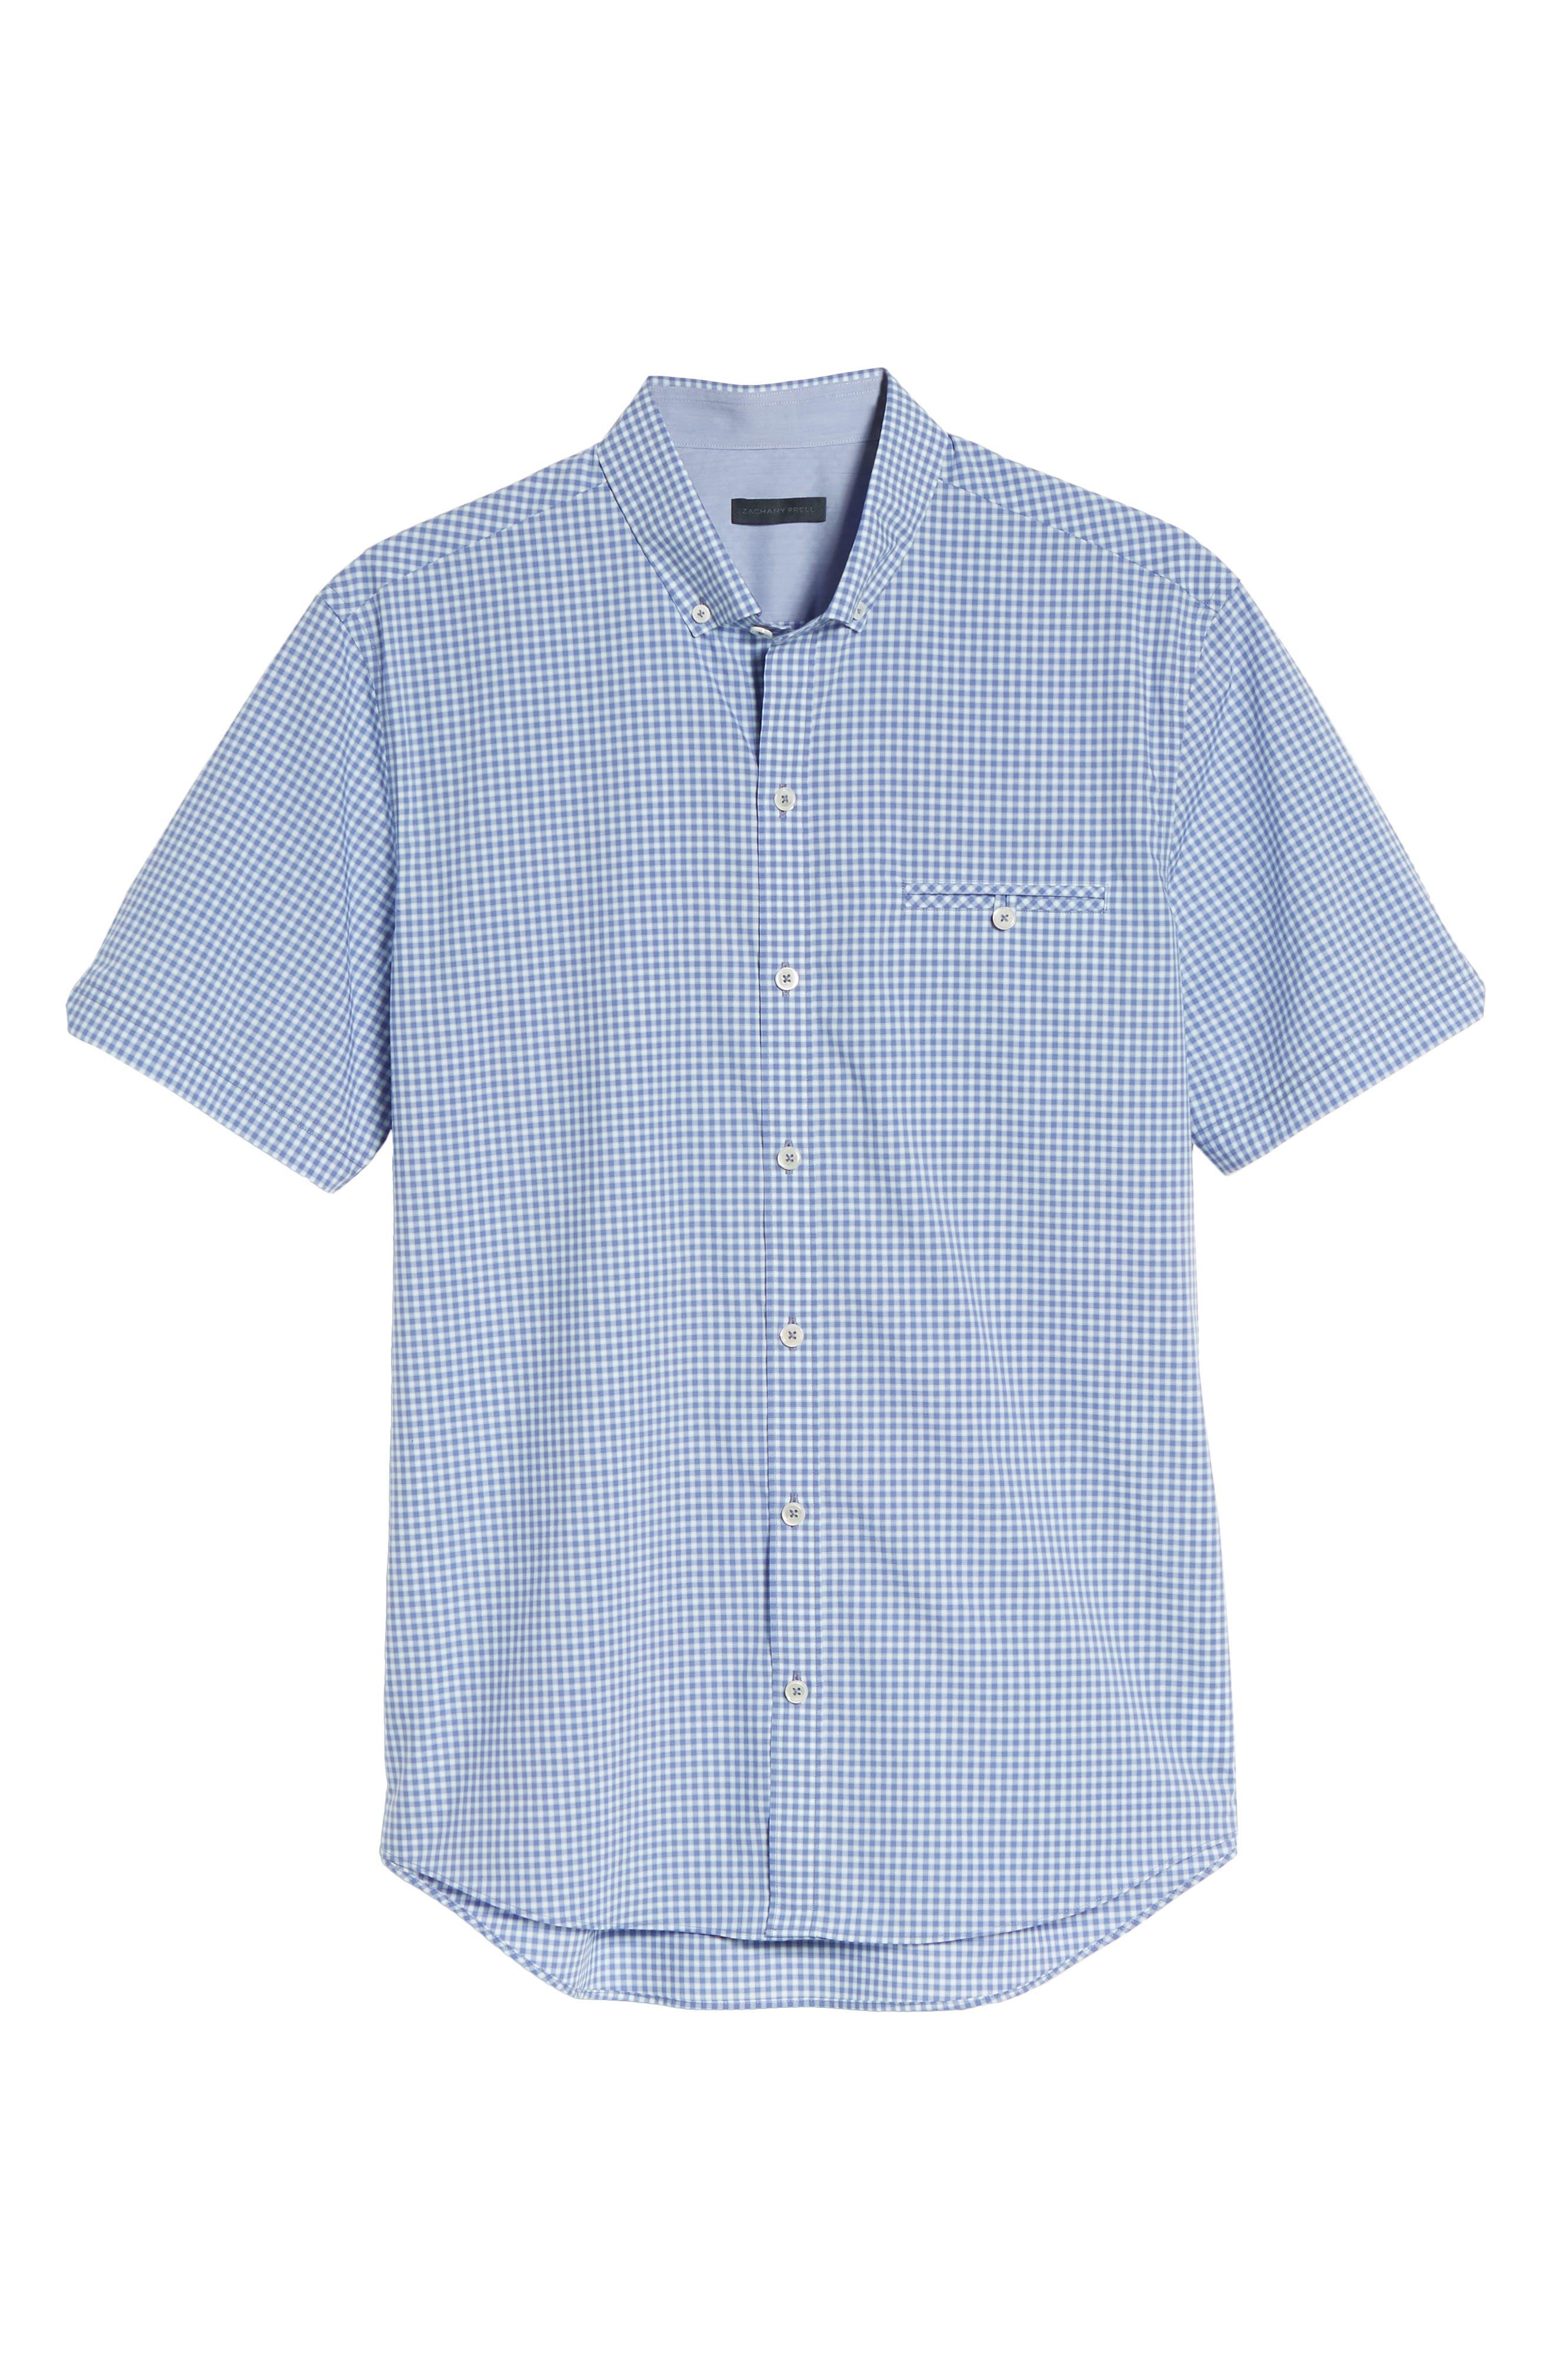 Giovinco Plaid Sport Shirt,                             Alternate thumbnail 6, color,                             OCEAN